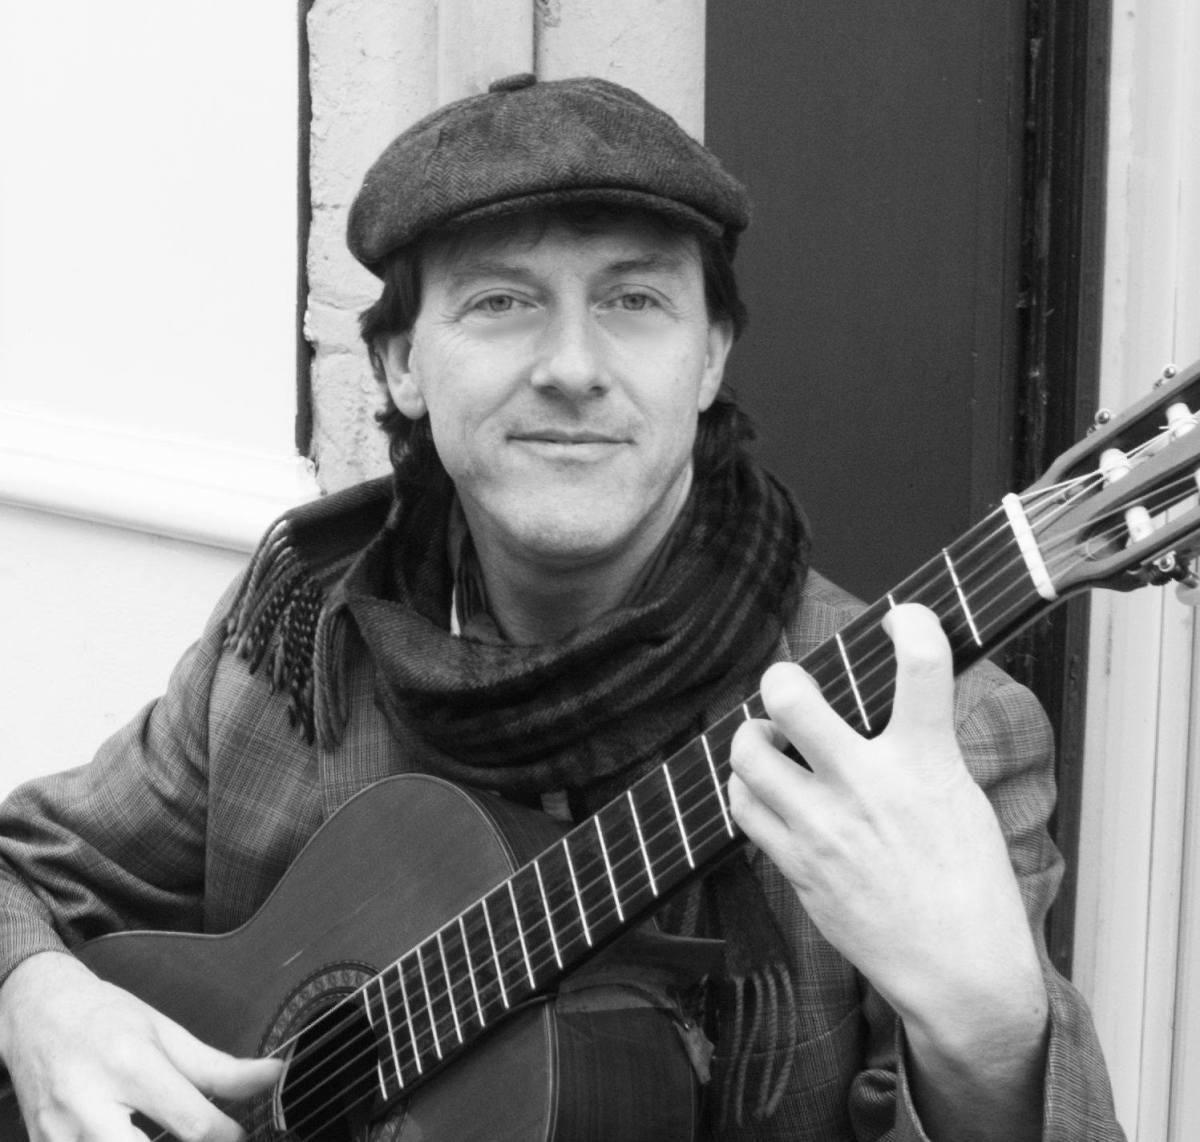 Greatest Love Themes: Andrew Hurst Joins Devizes TownBand